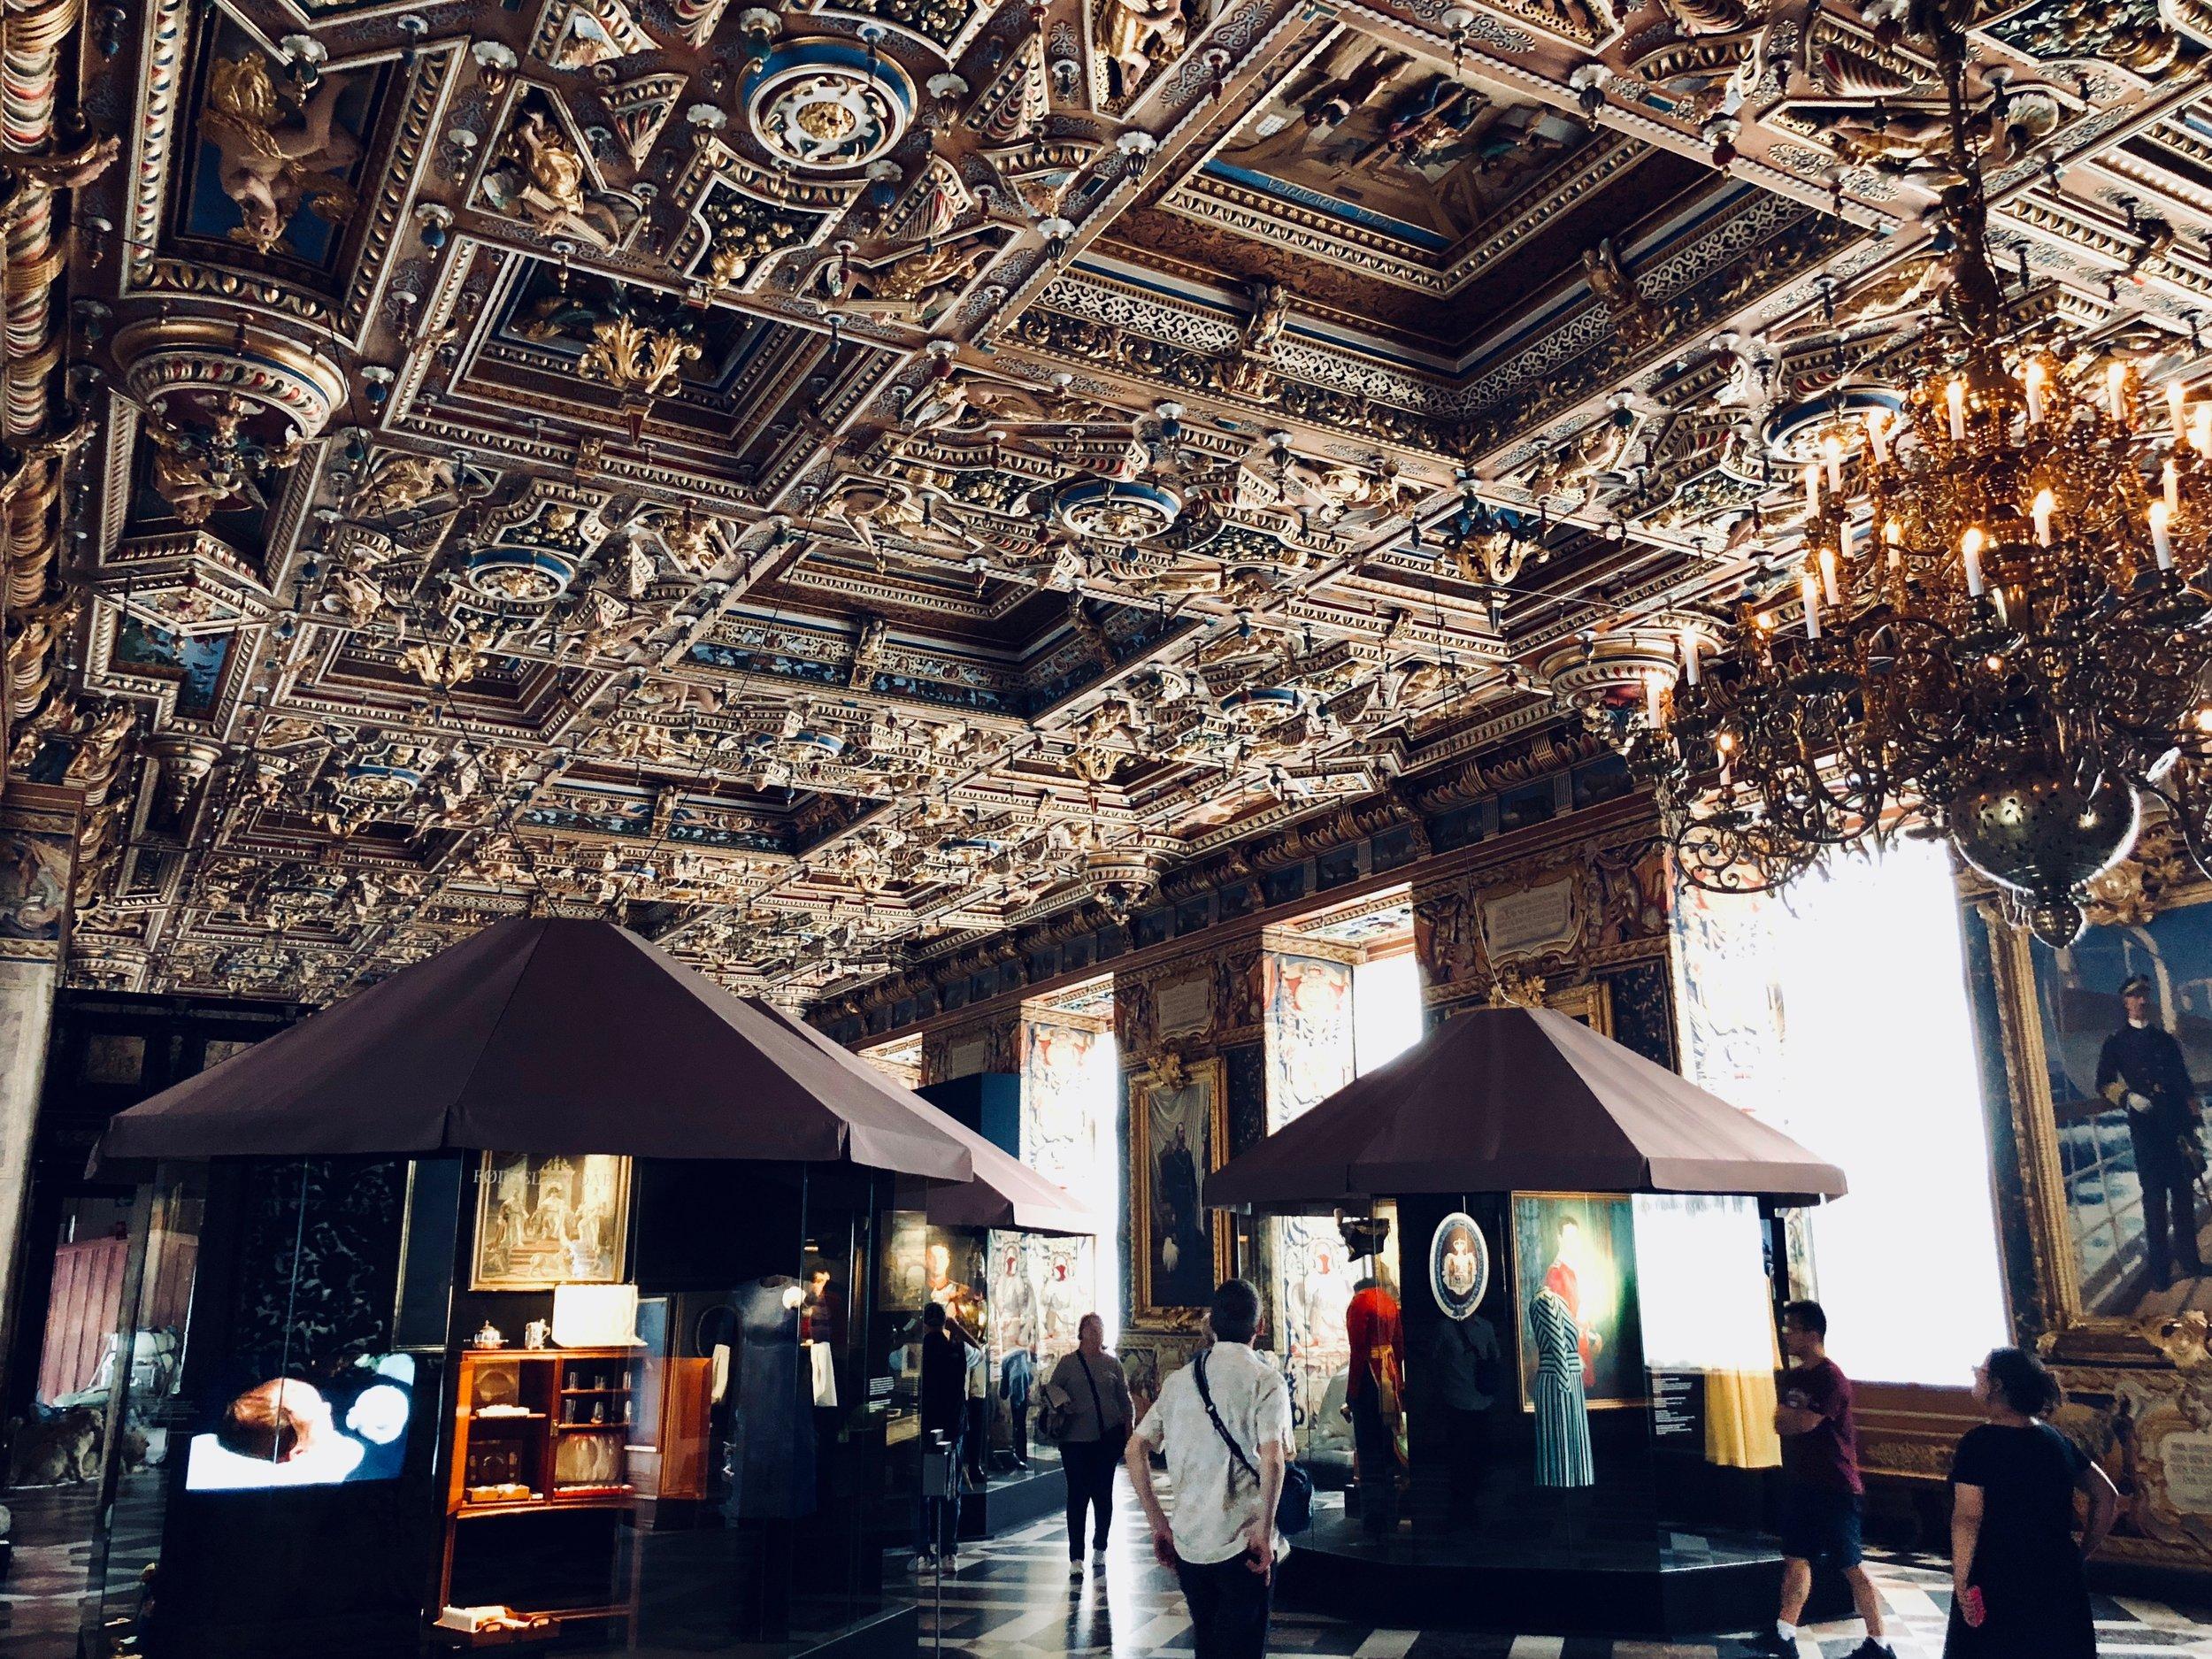 The Great Hall, Frederiksborg Castle, Hillerød, Denmark.